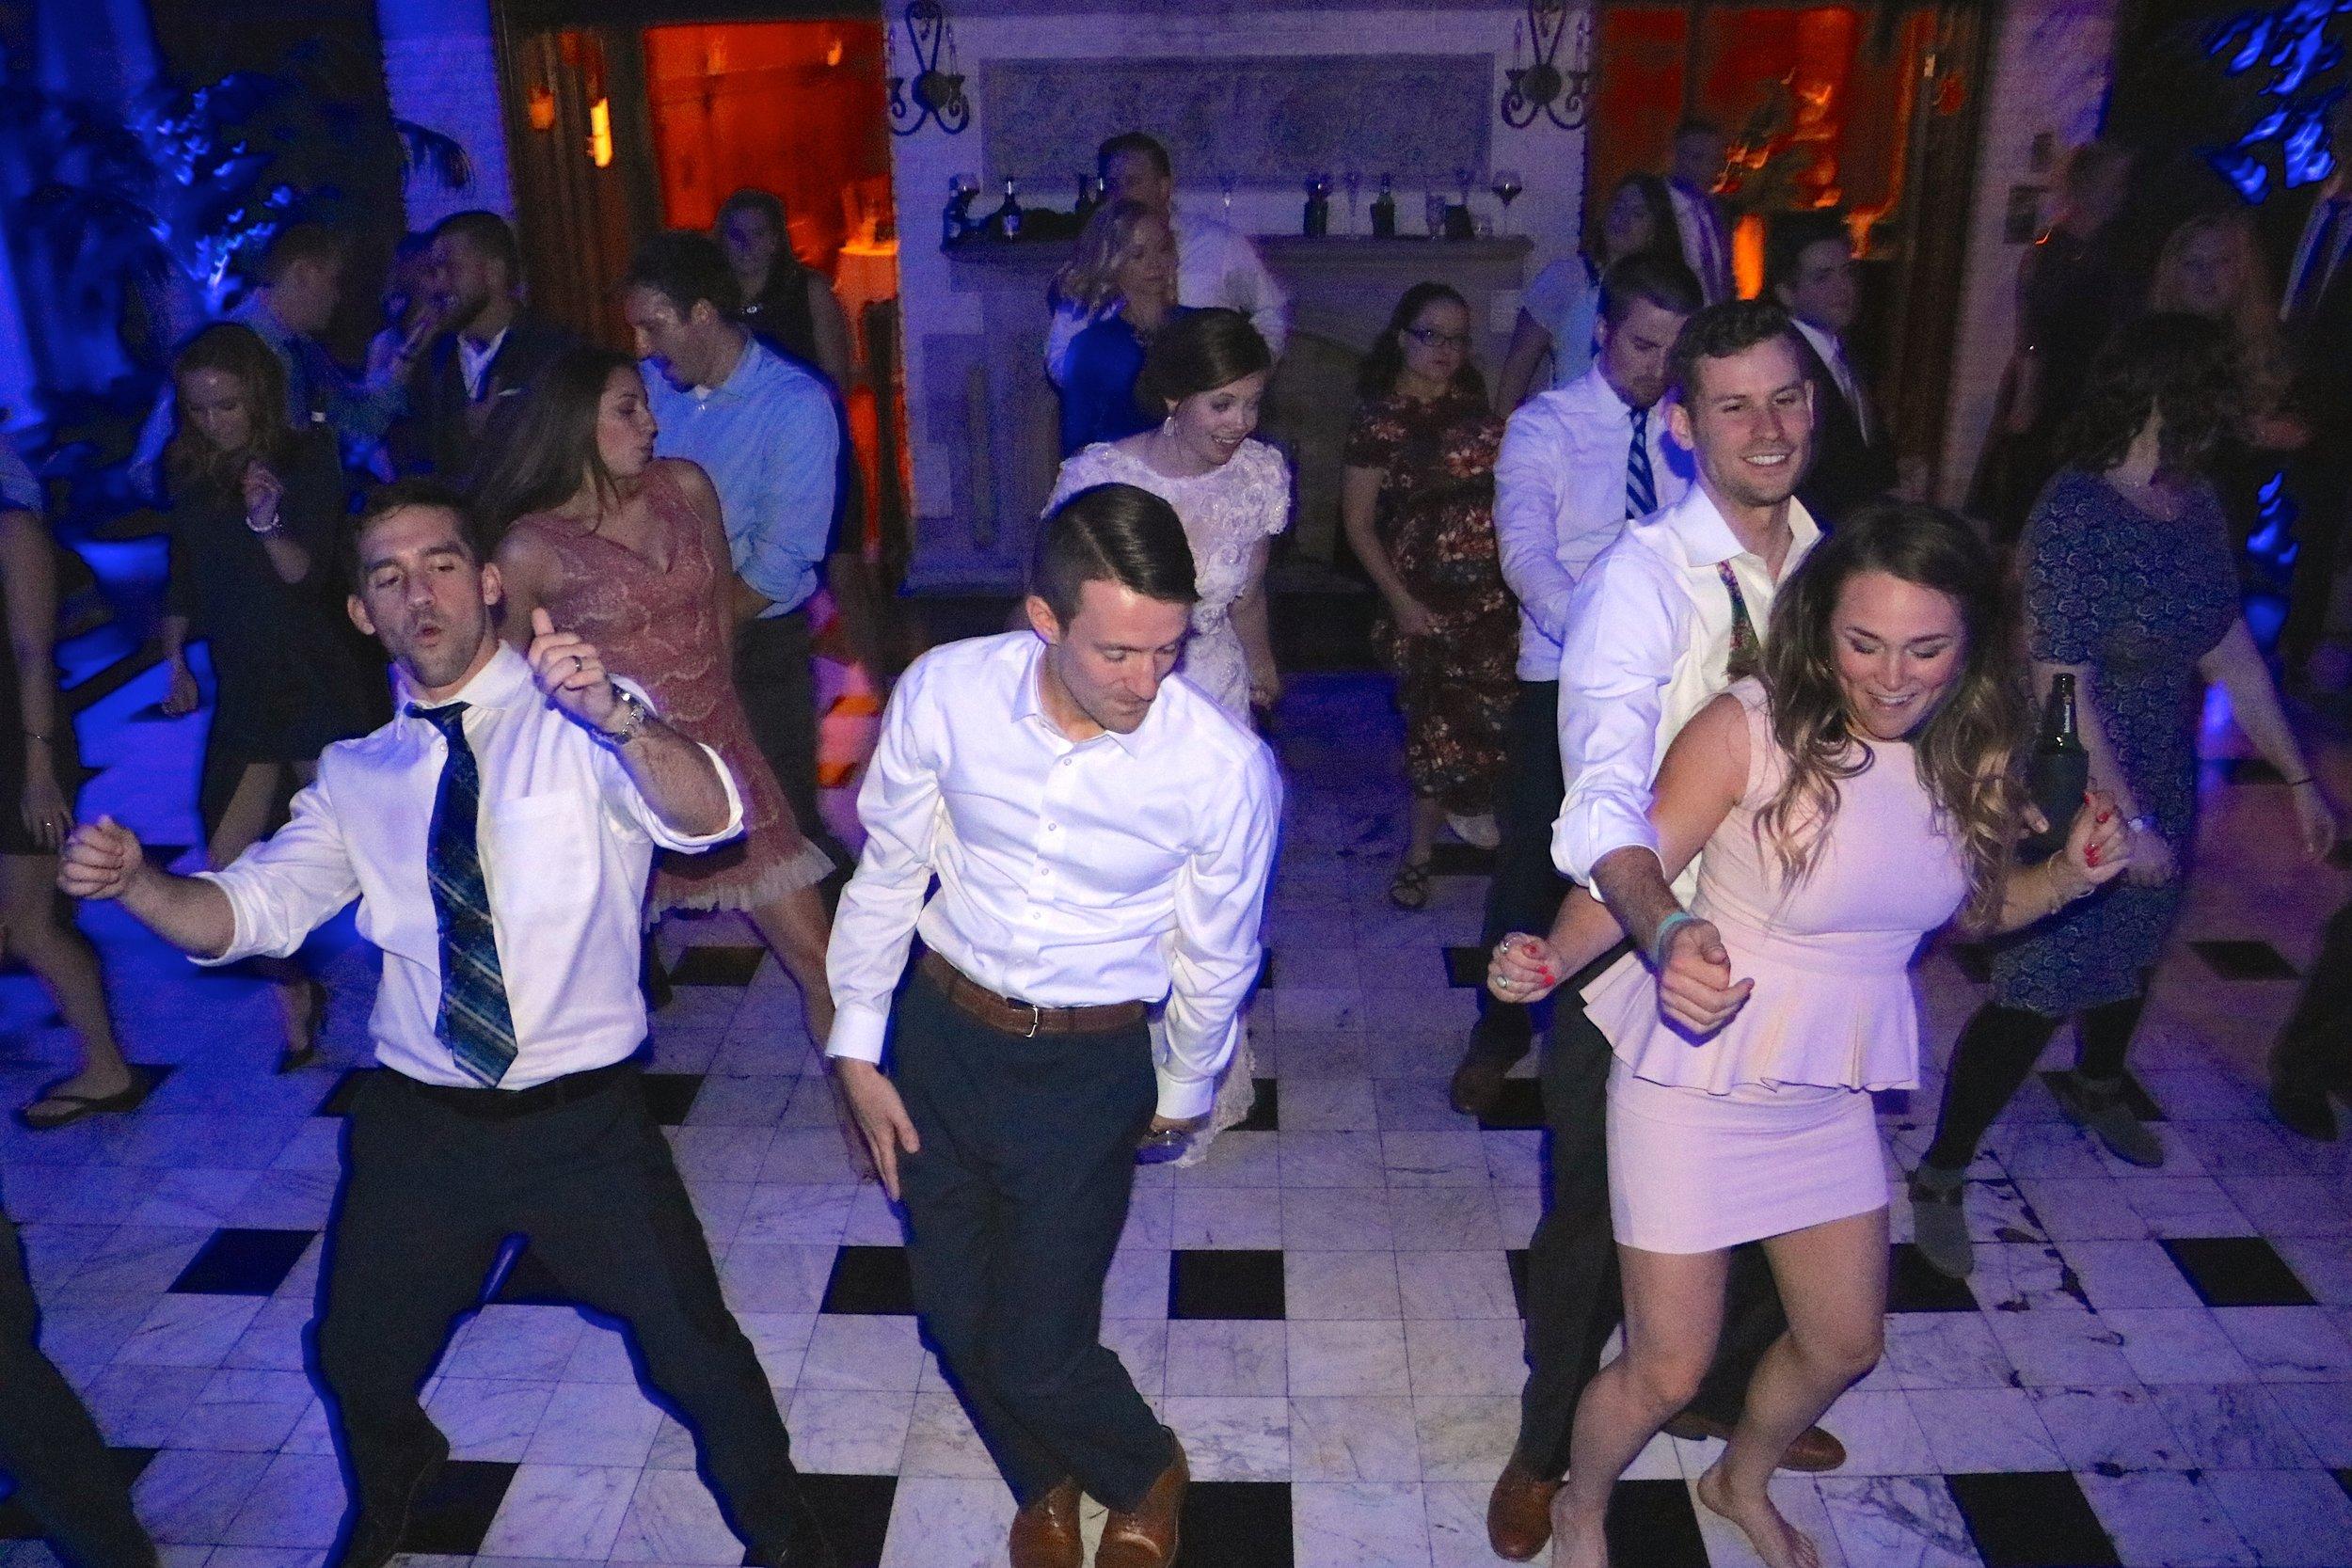 Jessica & Greg lead the dancing by DJ Jim Cerone